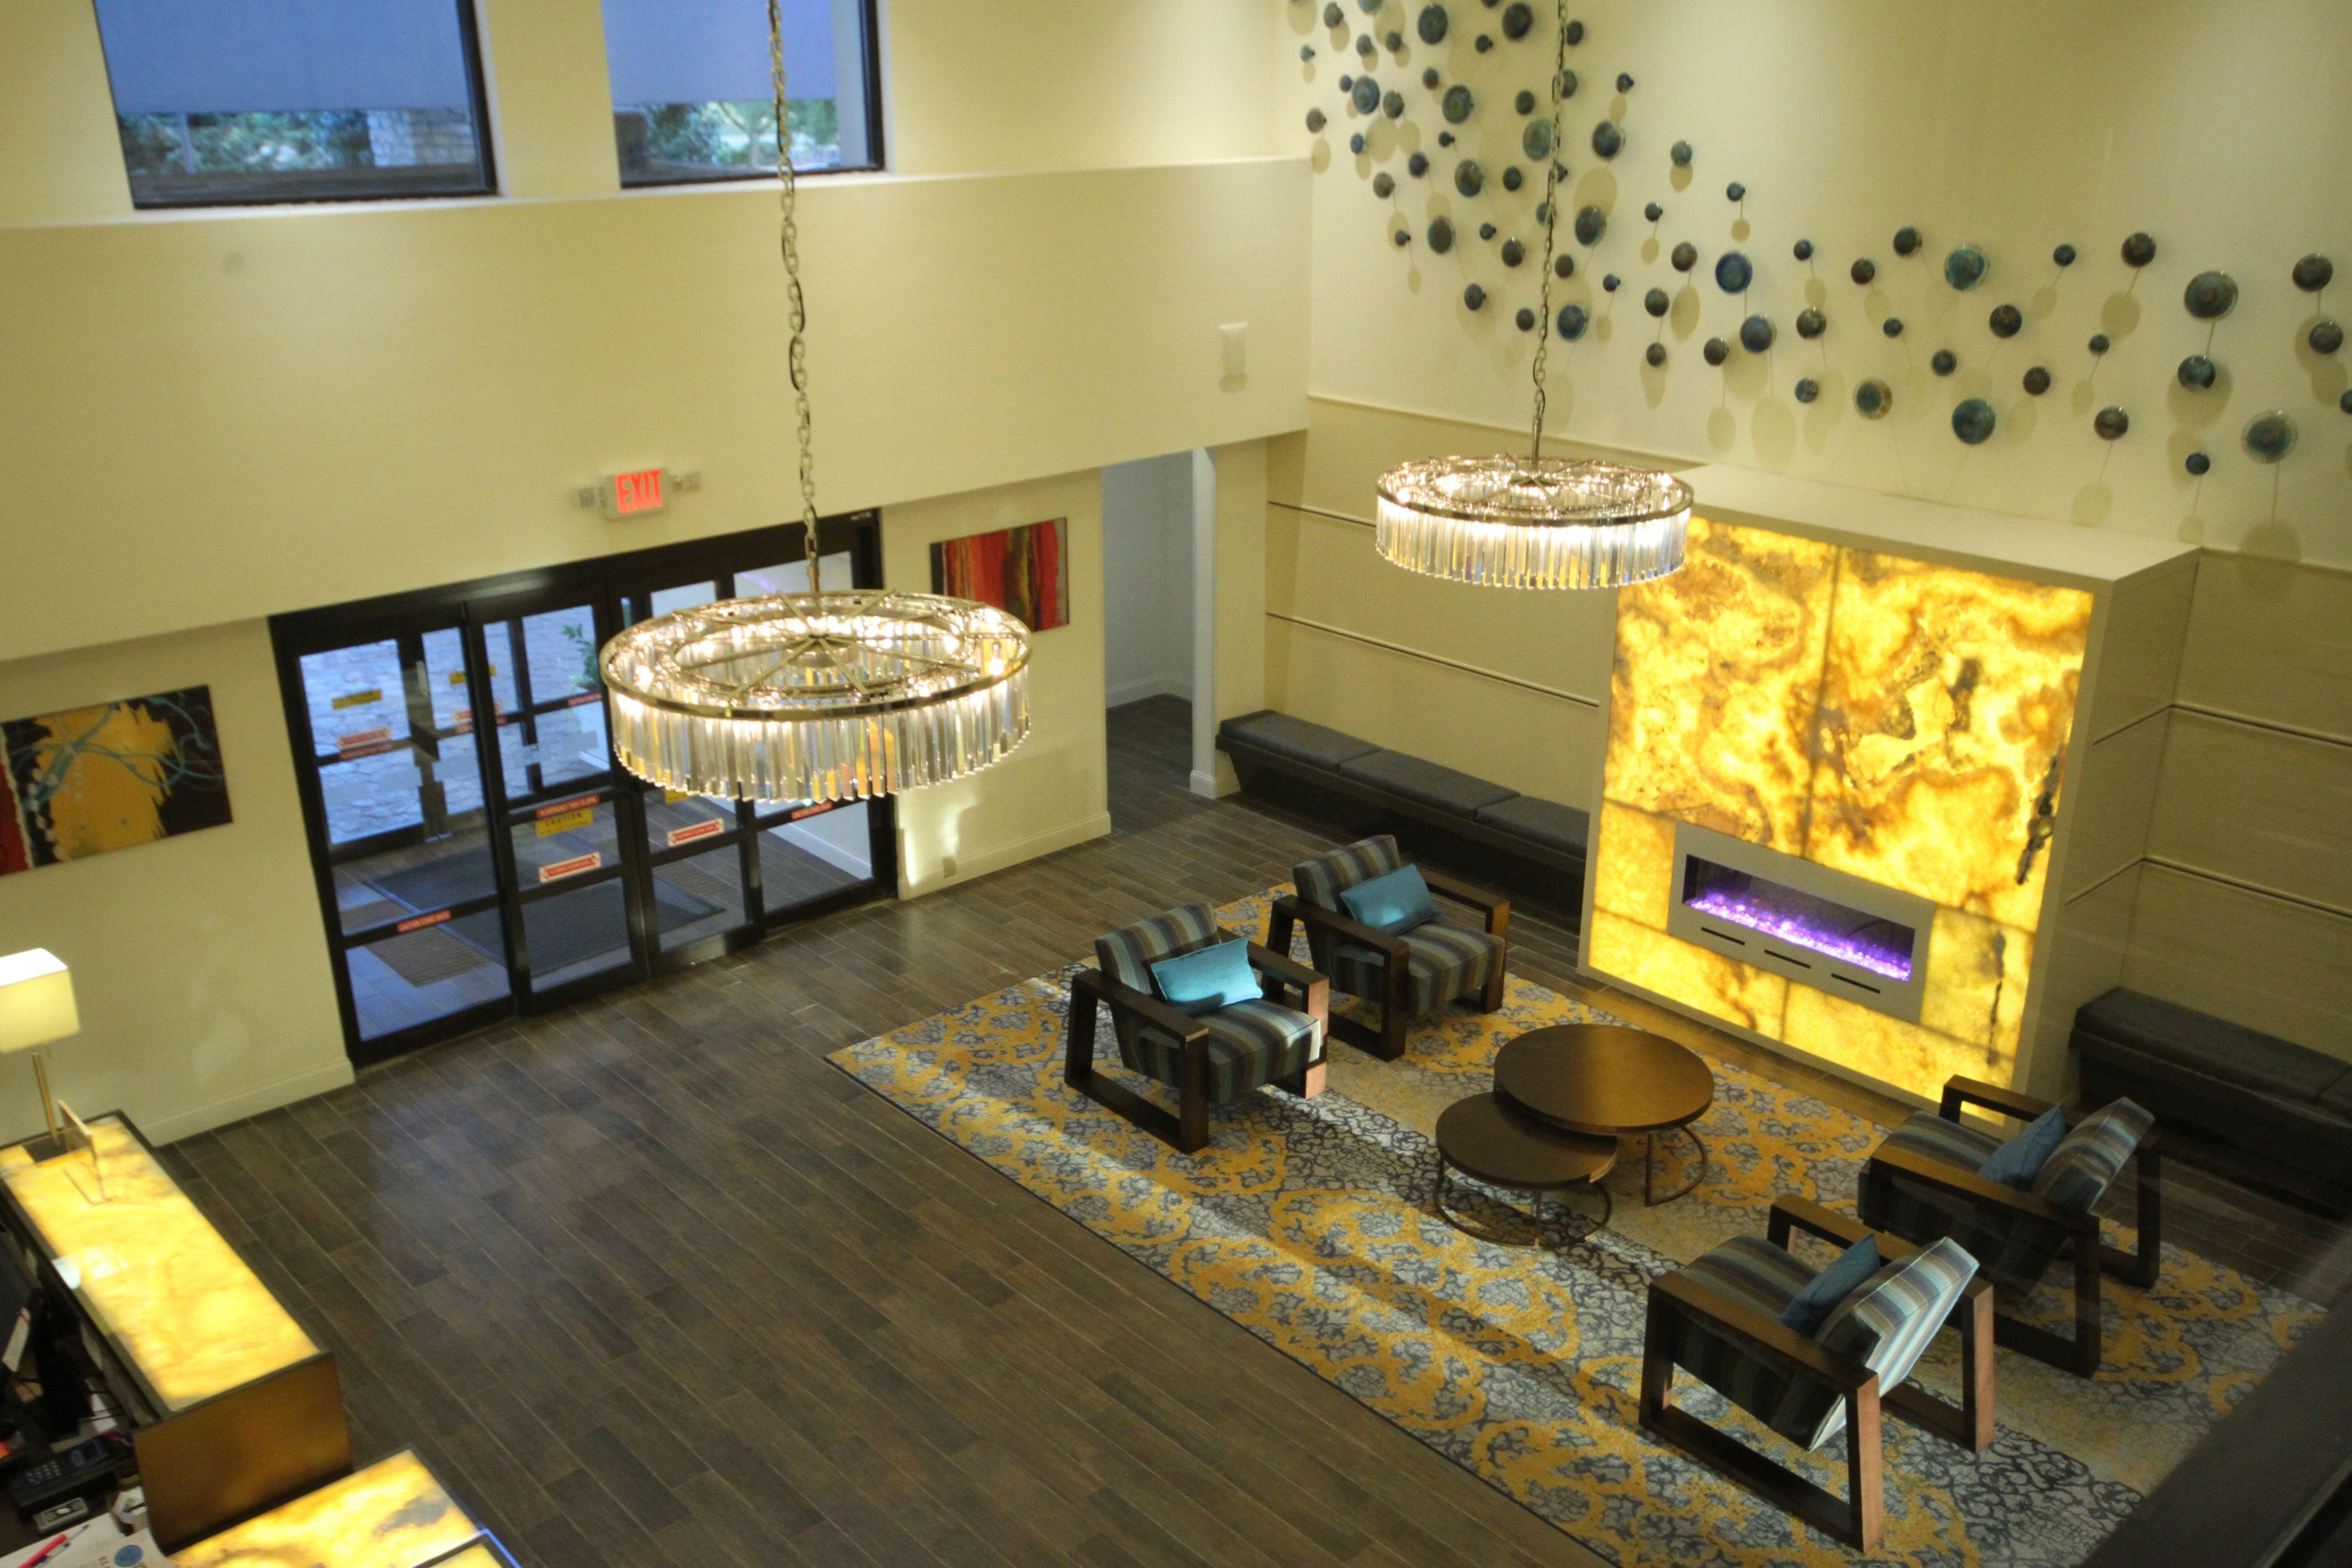 Holiday Inn Express Janesville-I-90 & Us Hwy 14 image 4